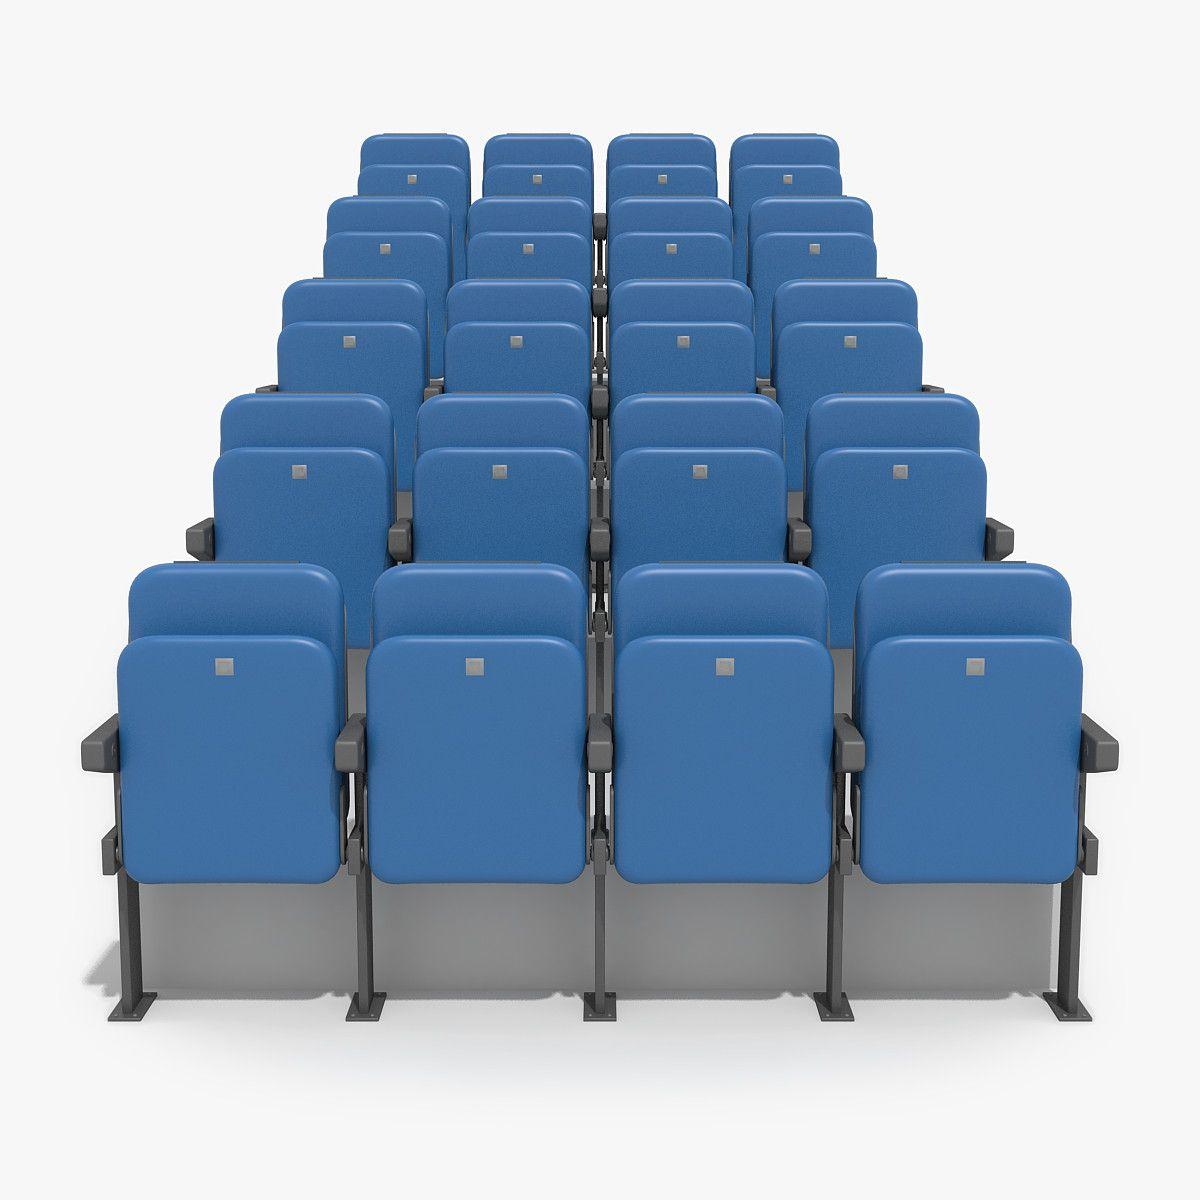 max stadium chairs - 3d model | 3d-modeling | pinterest